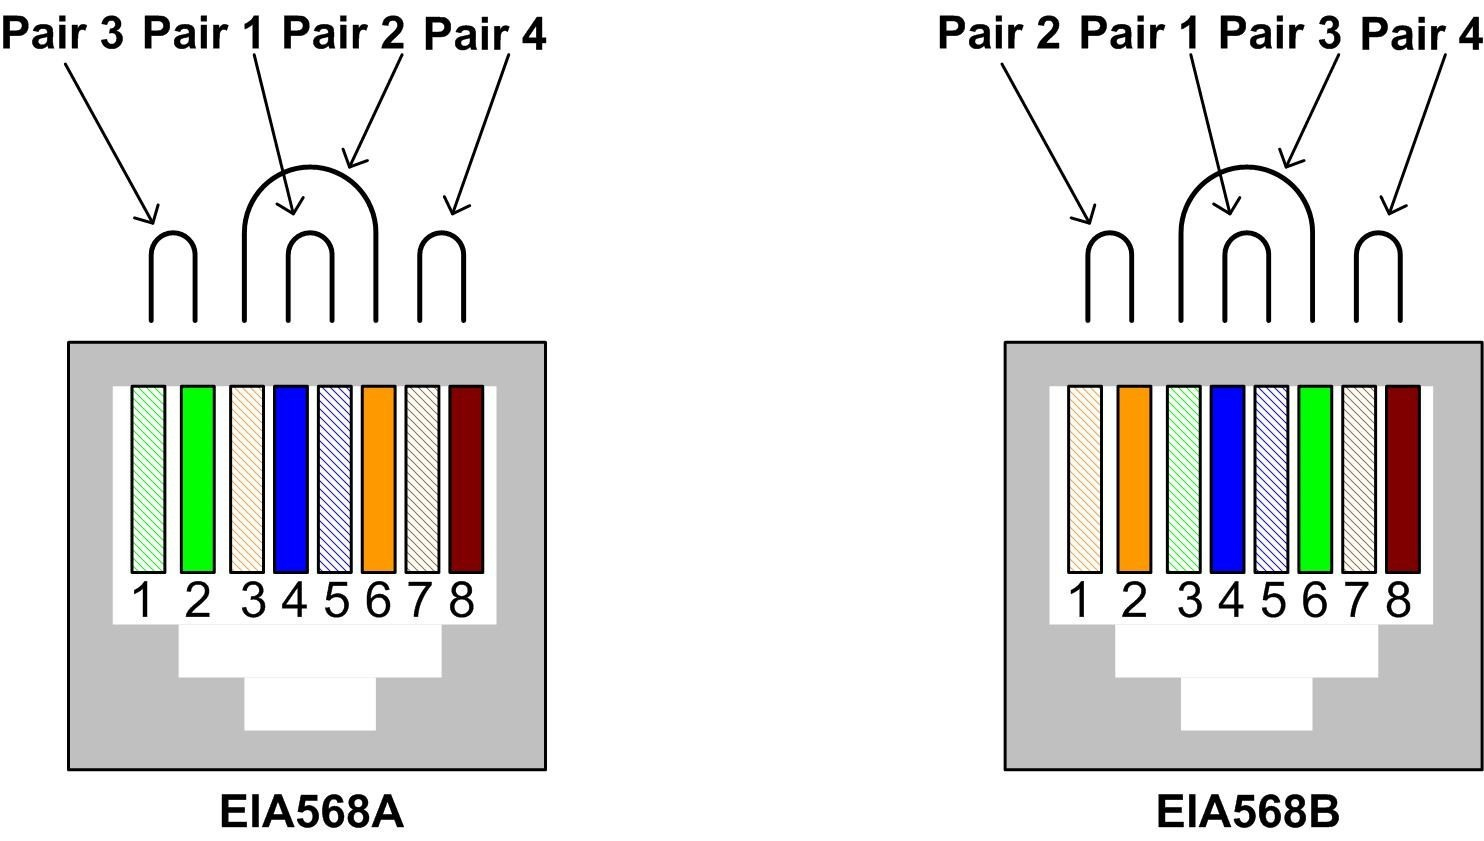 Cat5E Wiring Diagram - Data Wiring Diagram Schematic - Cat5E Wiring Diagram